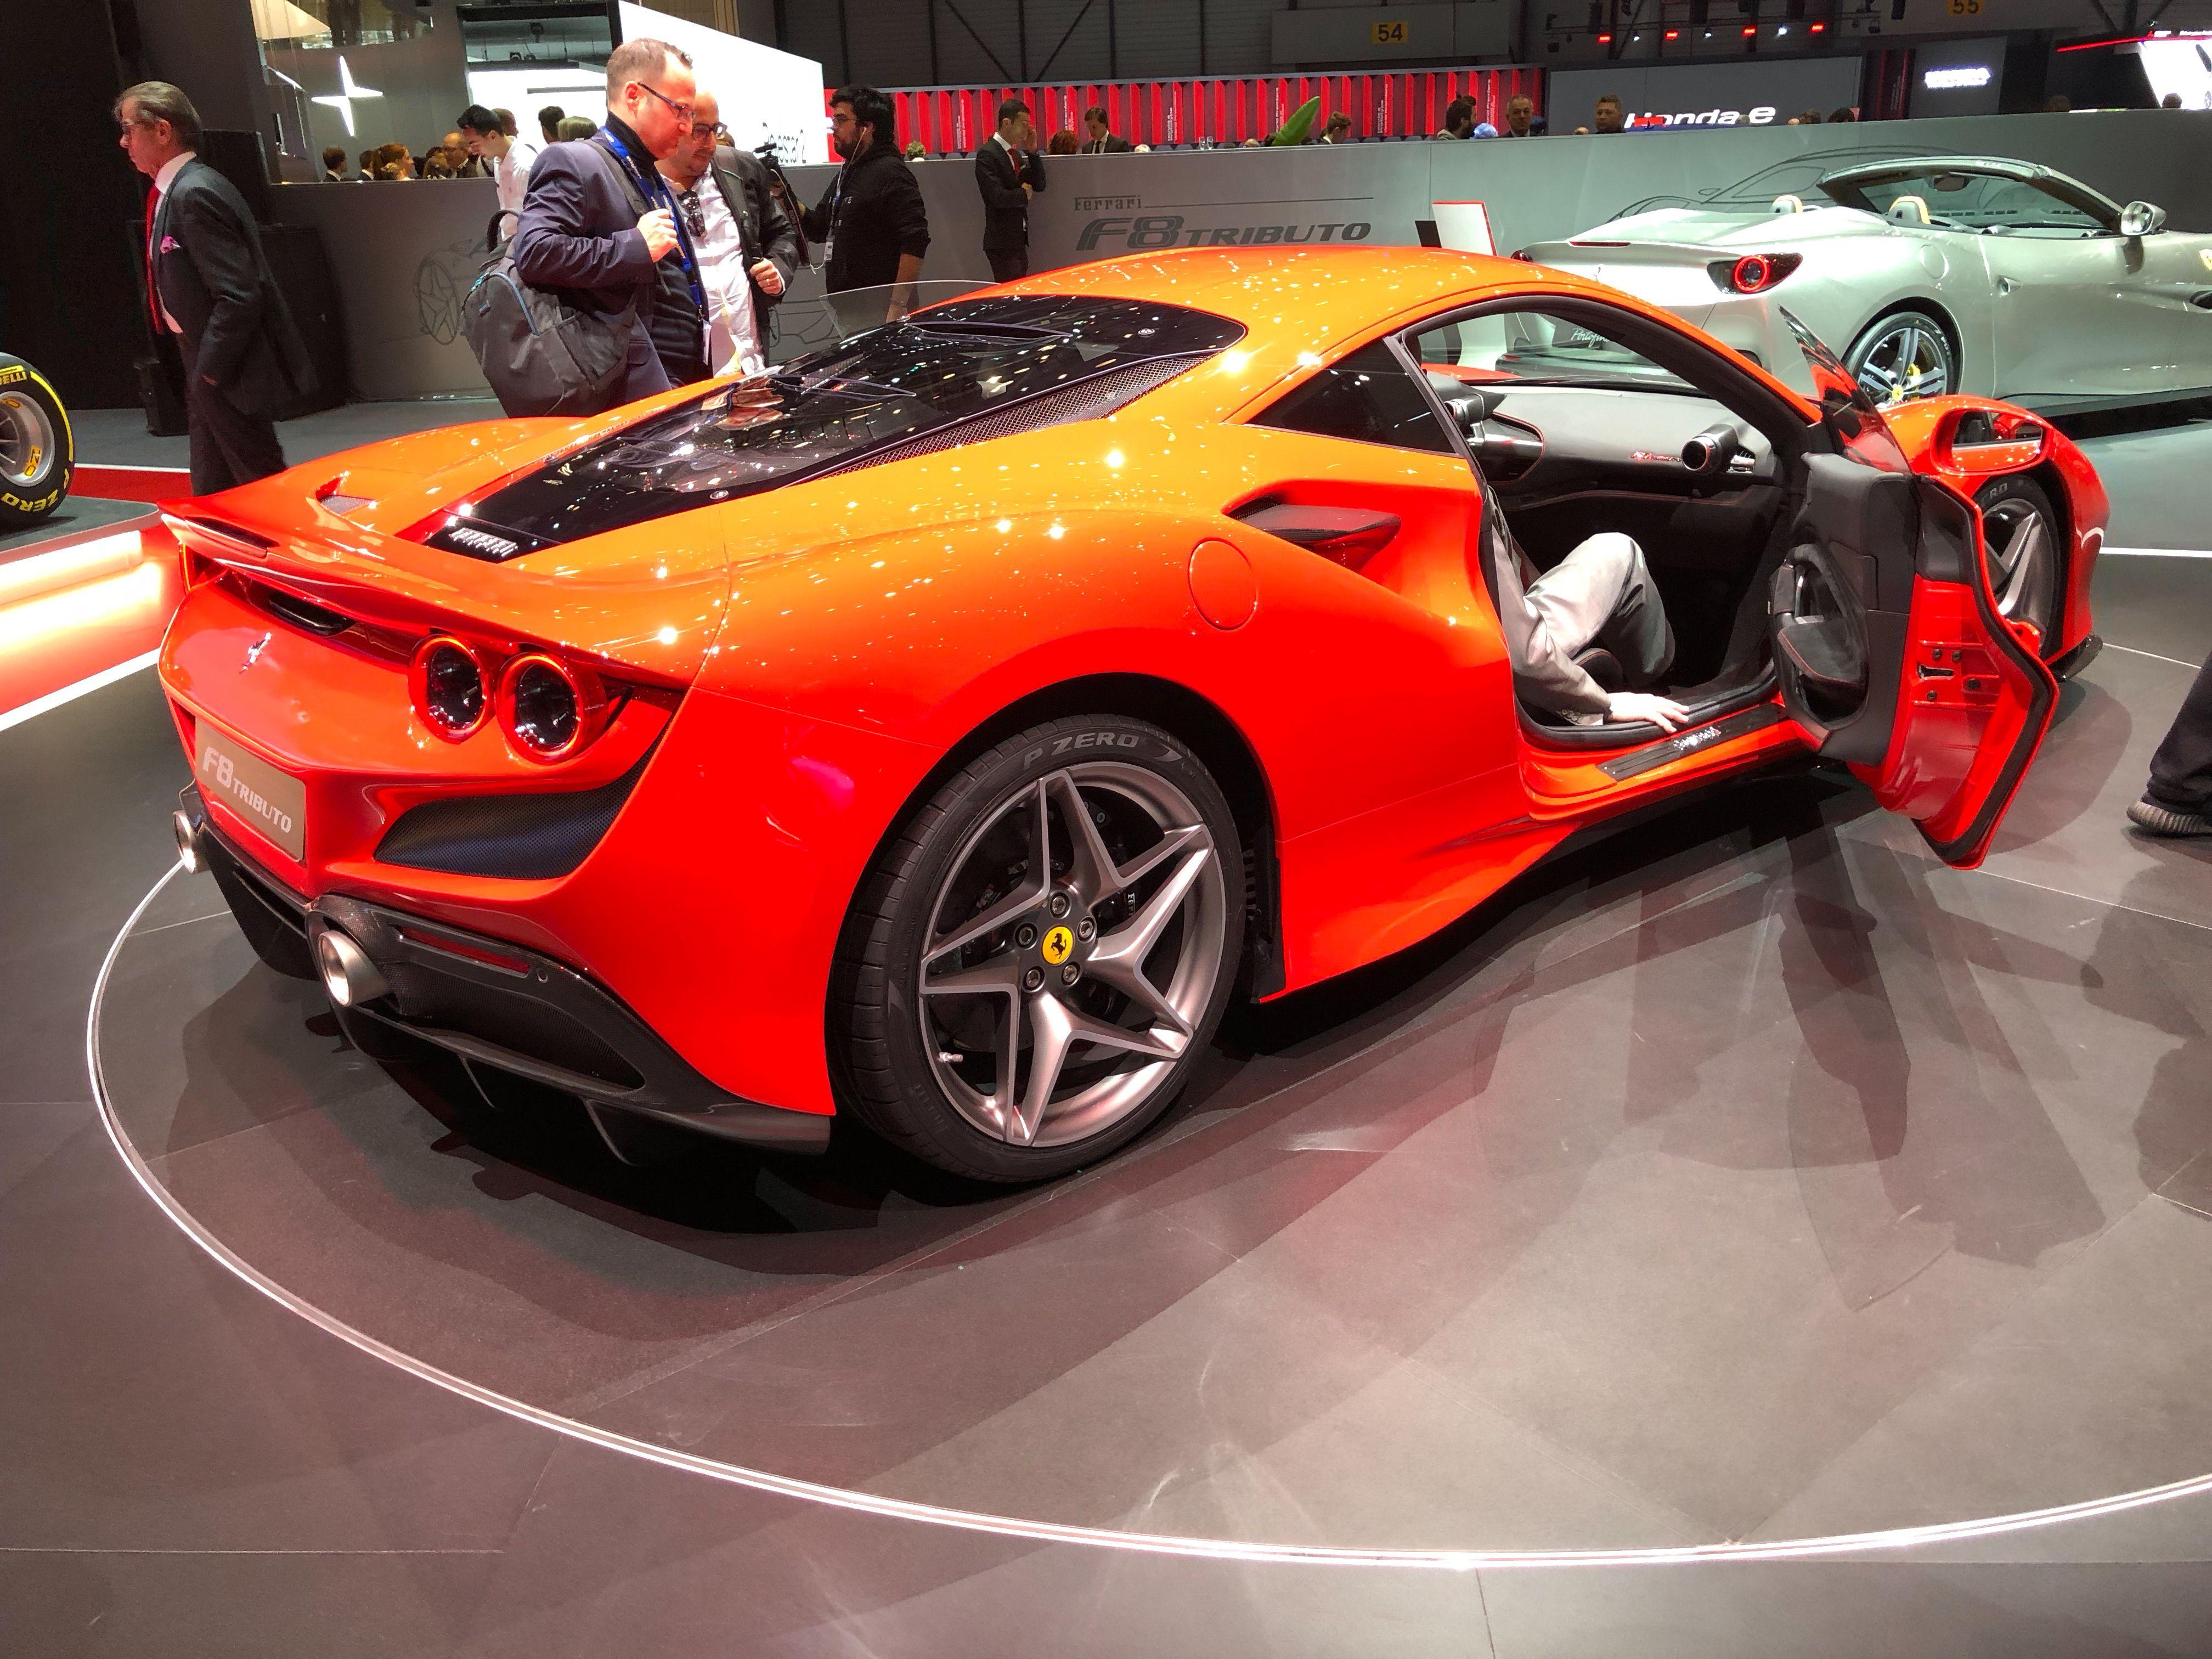 2019 Ferrari F8 Tributo Interior Cars Wallpapers Hd